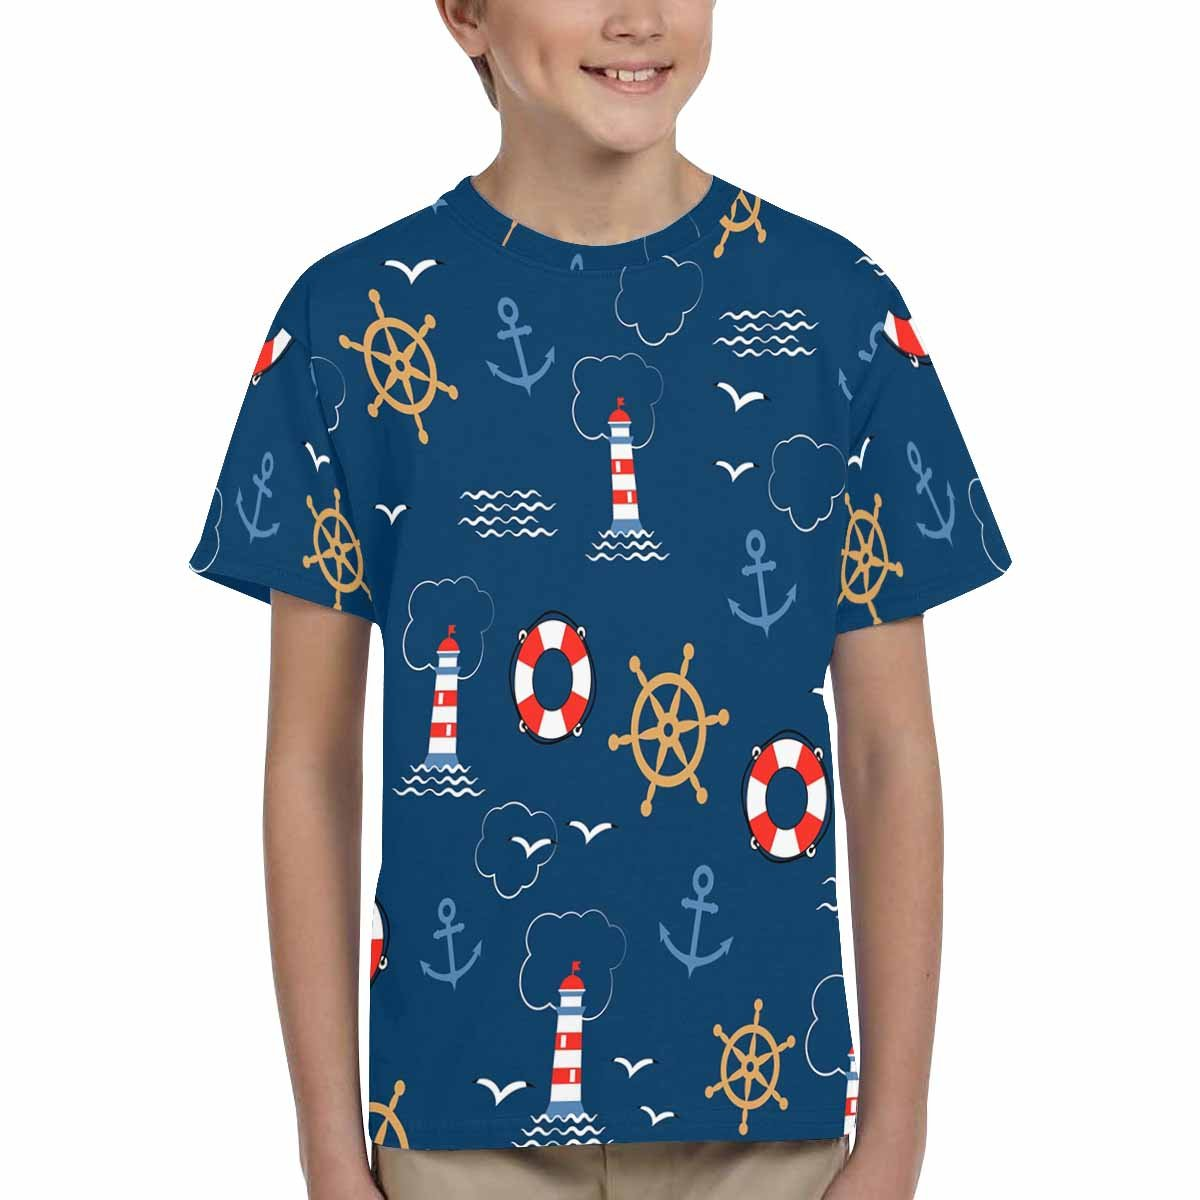 Seagulls INTERESTPRINT Kids T-Shirt Sea Anchors XS-XL Helms Lifebuoys